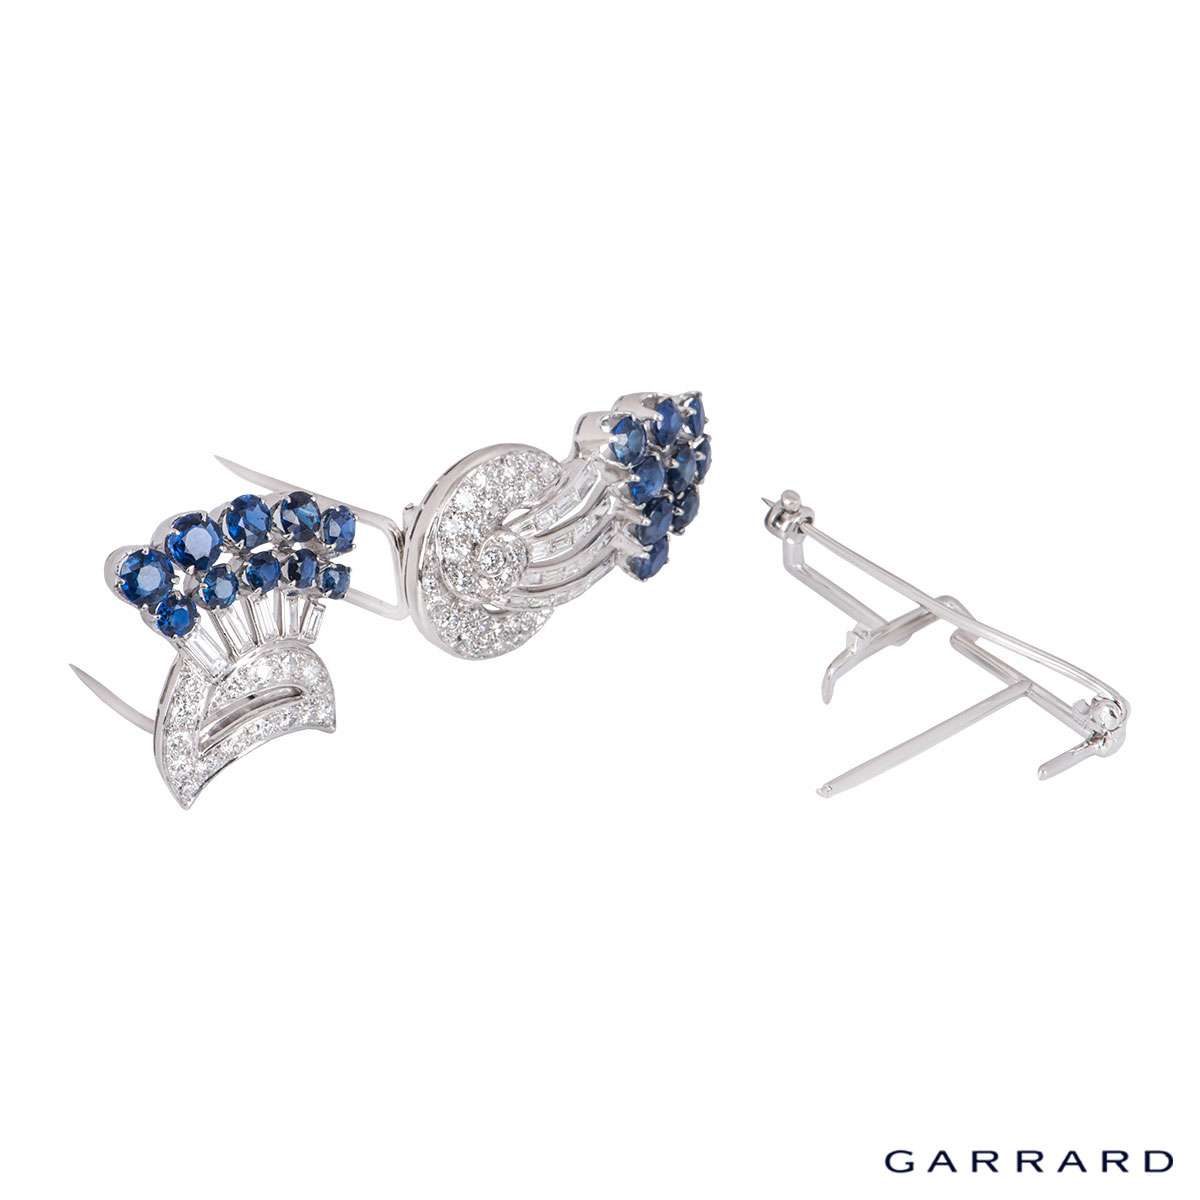 Garrard Diamond and Sapphire Brooch Circa 1950